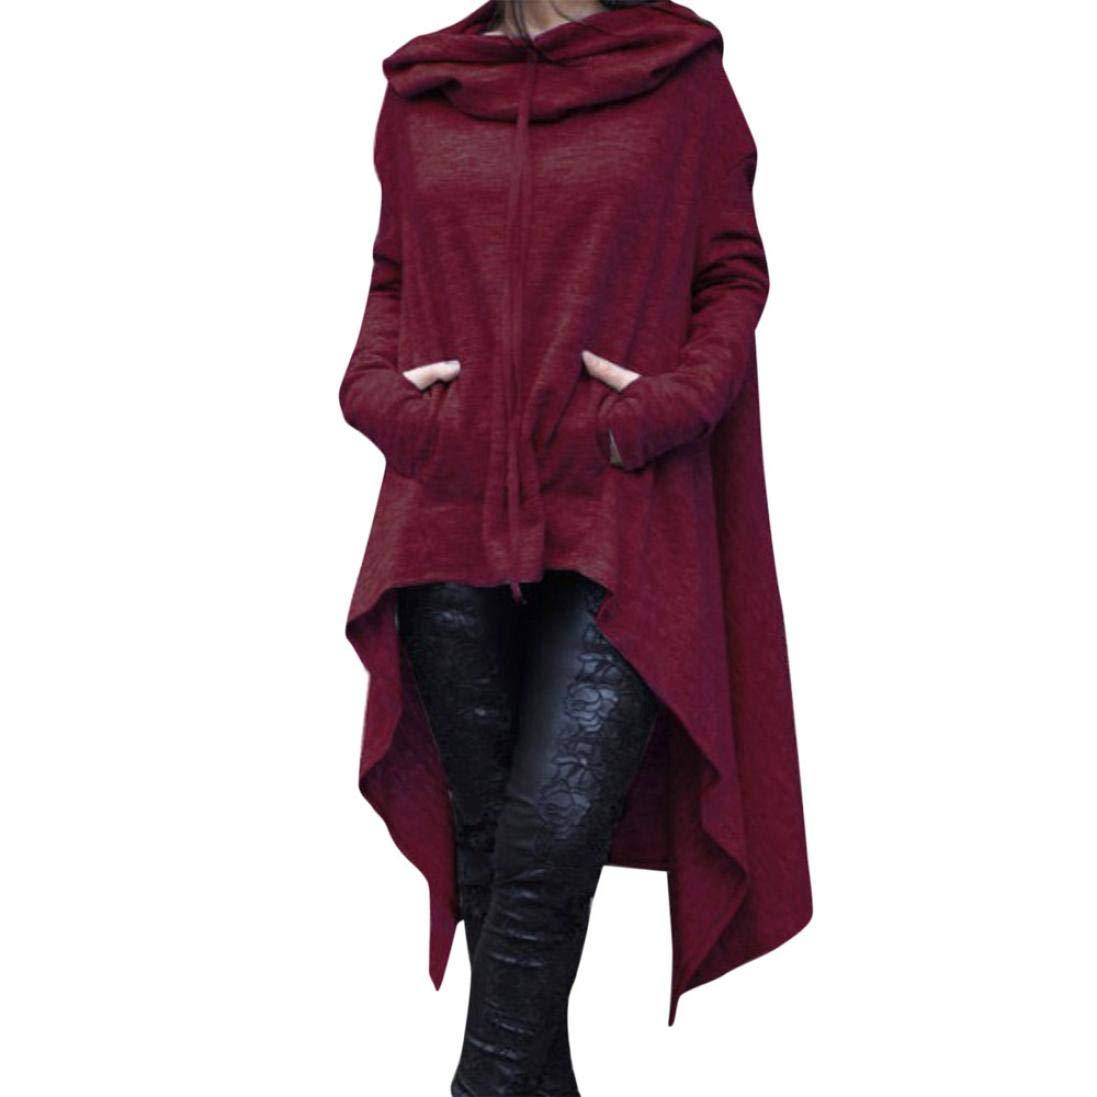 Rambling New Women's Pullover Irregular Hem Long Drawstring Loose Hoodie Top Dress